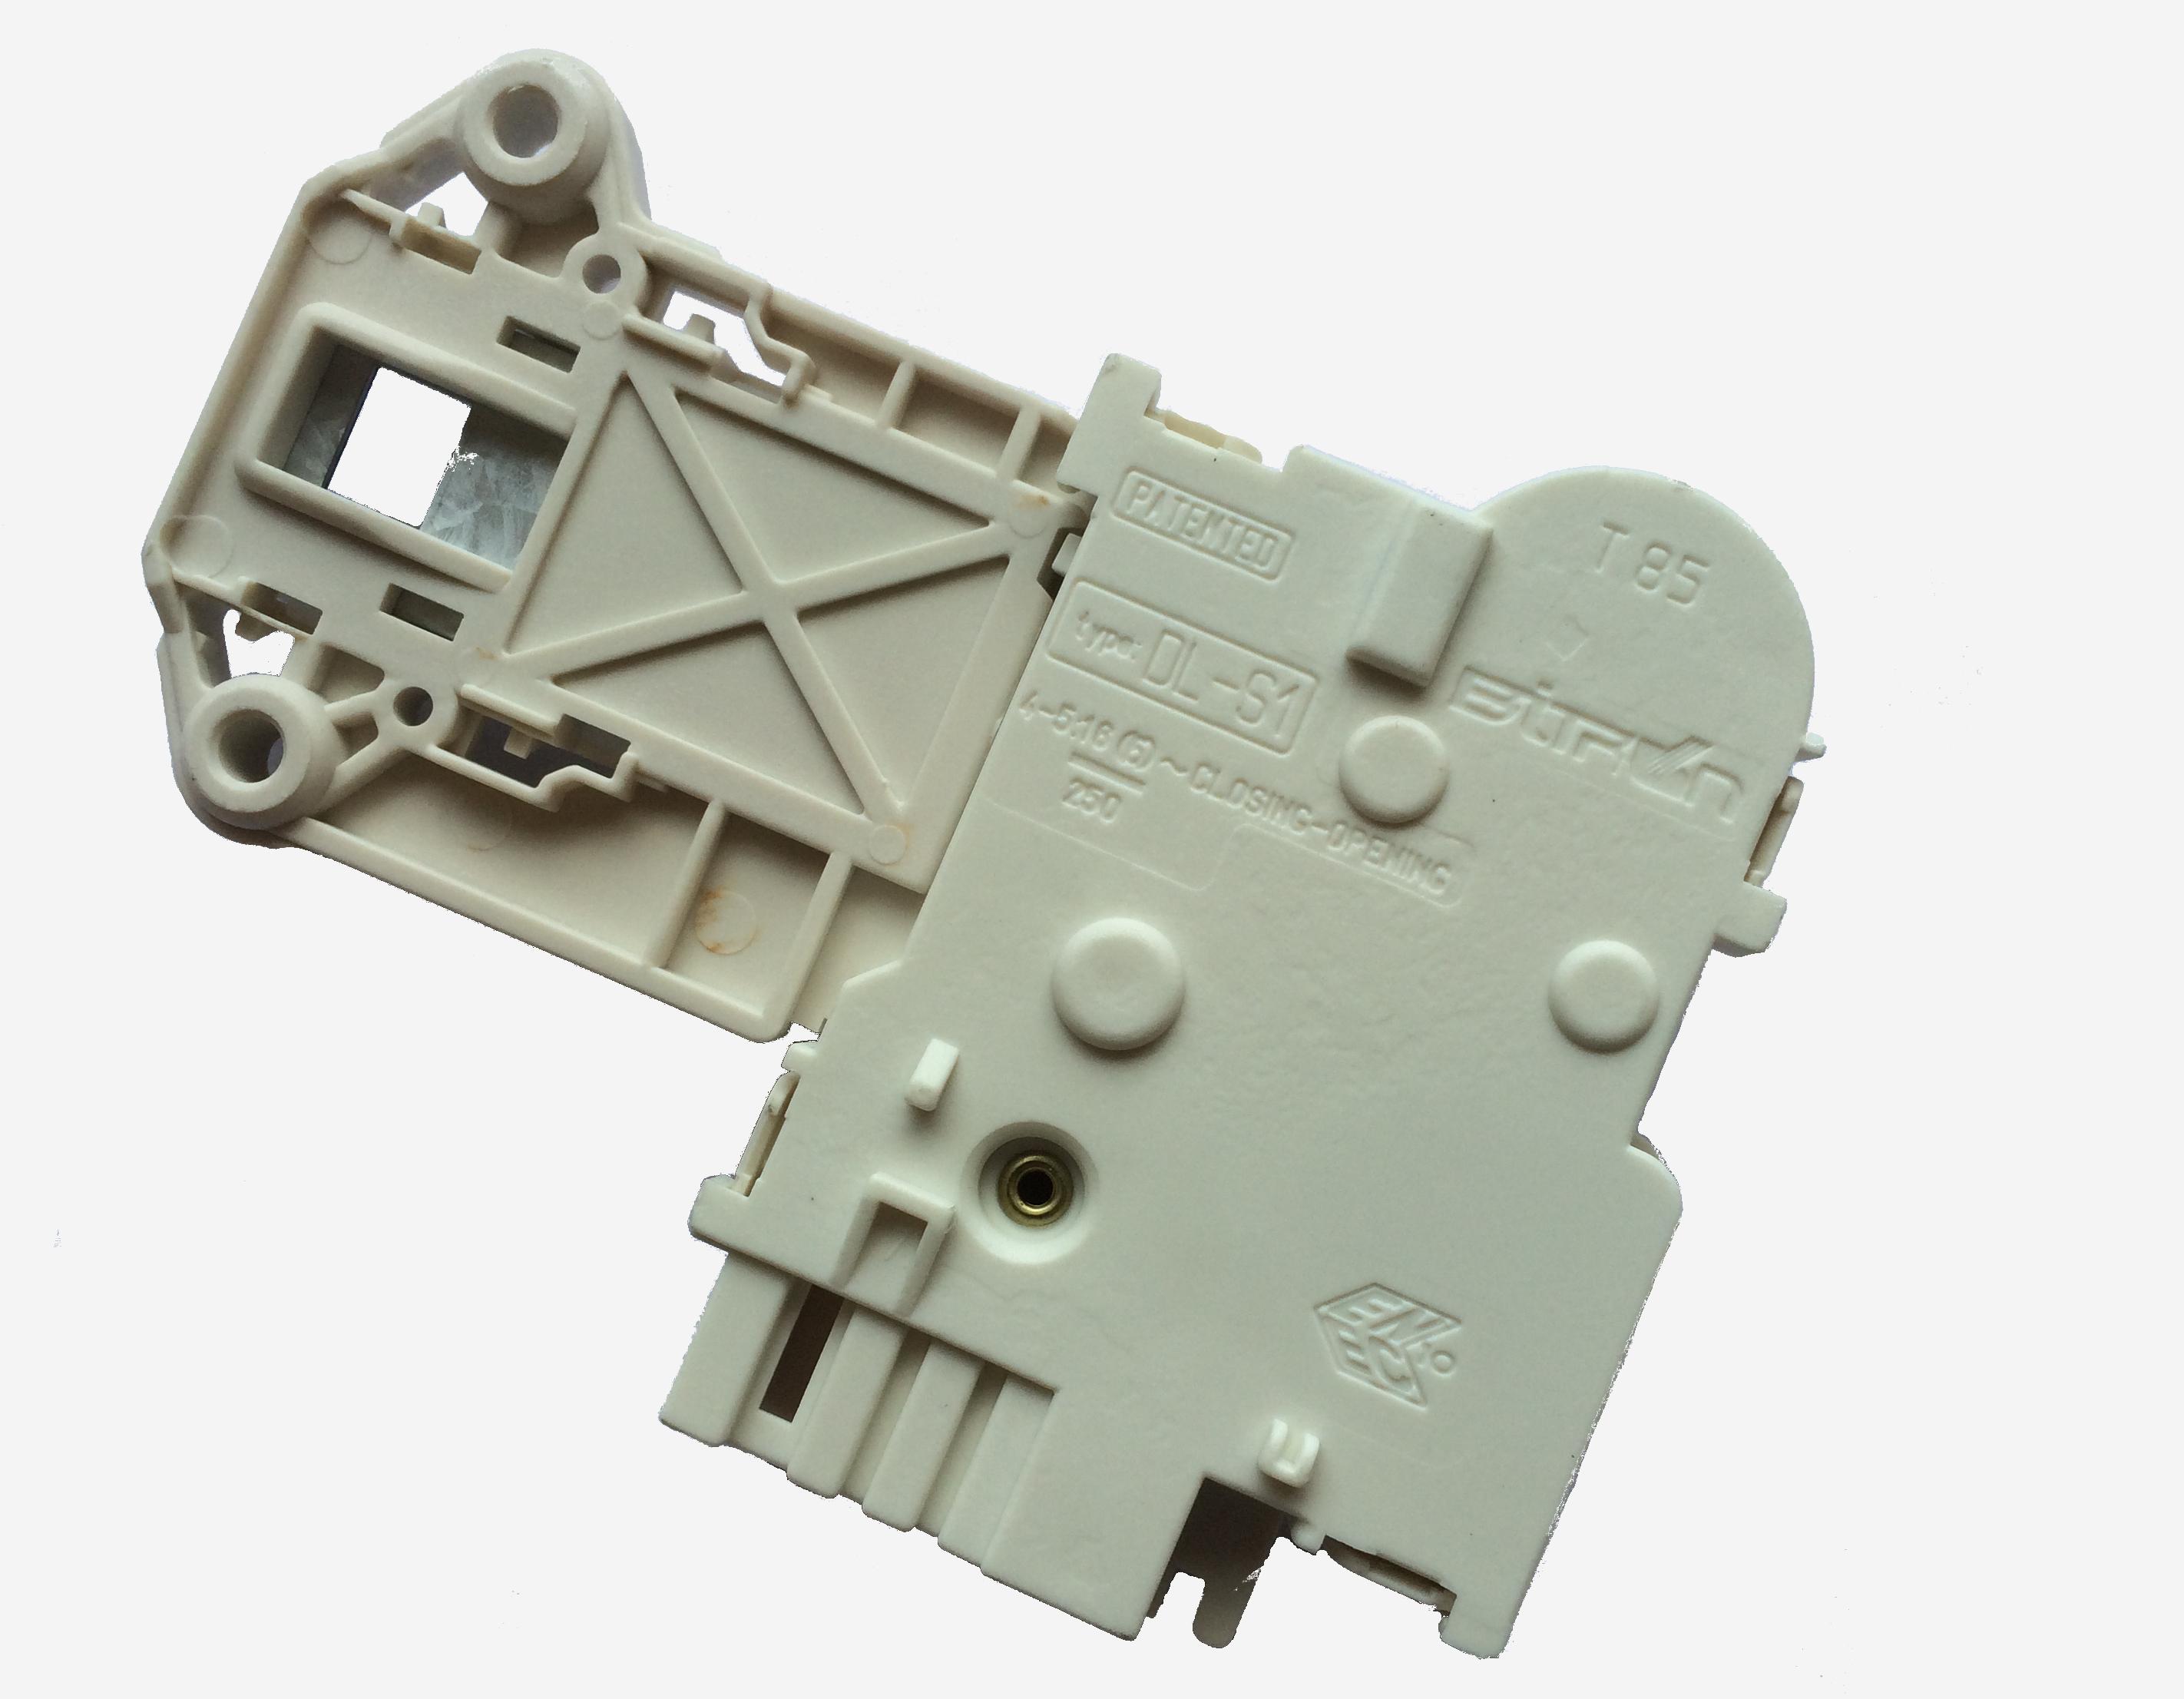 Washing Machine Door Lock Wiring Diagram : Original aeg lavadora puerta cerradura interlock